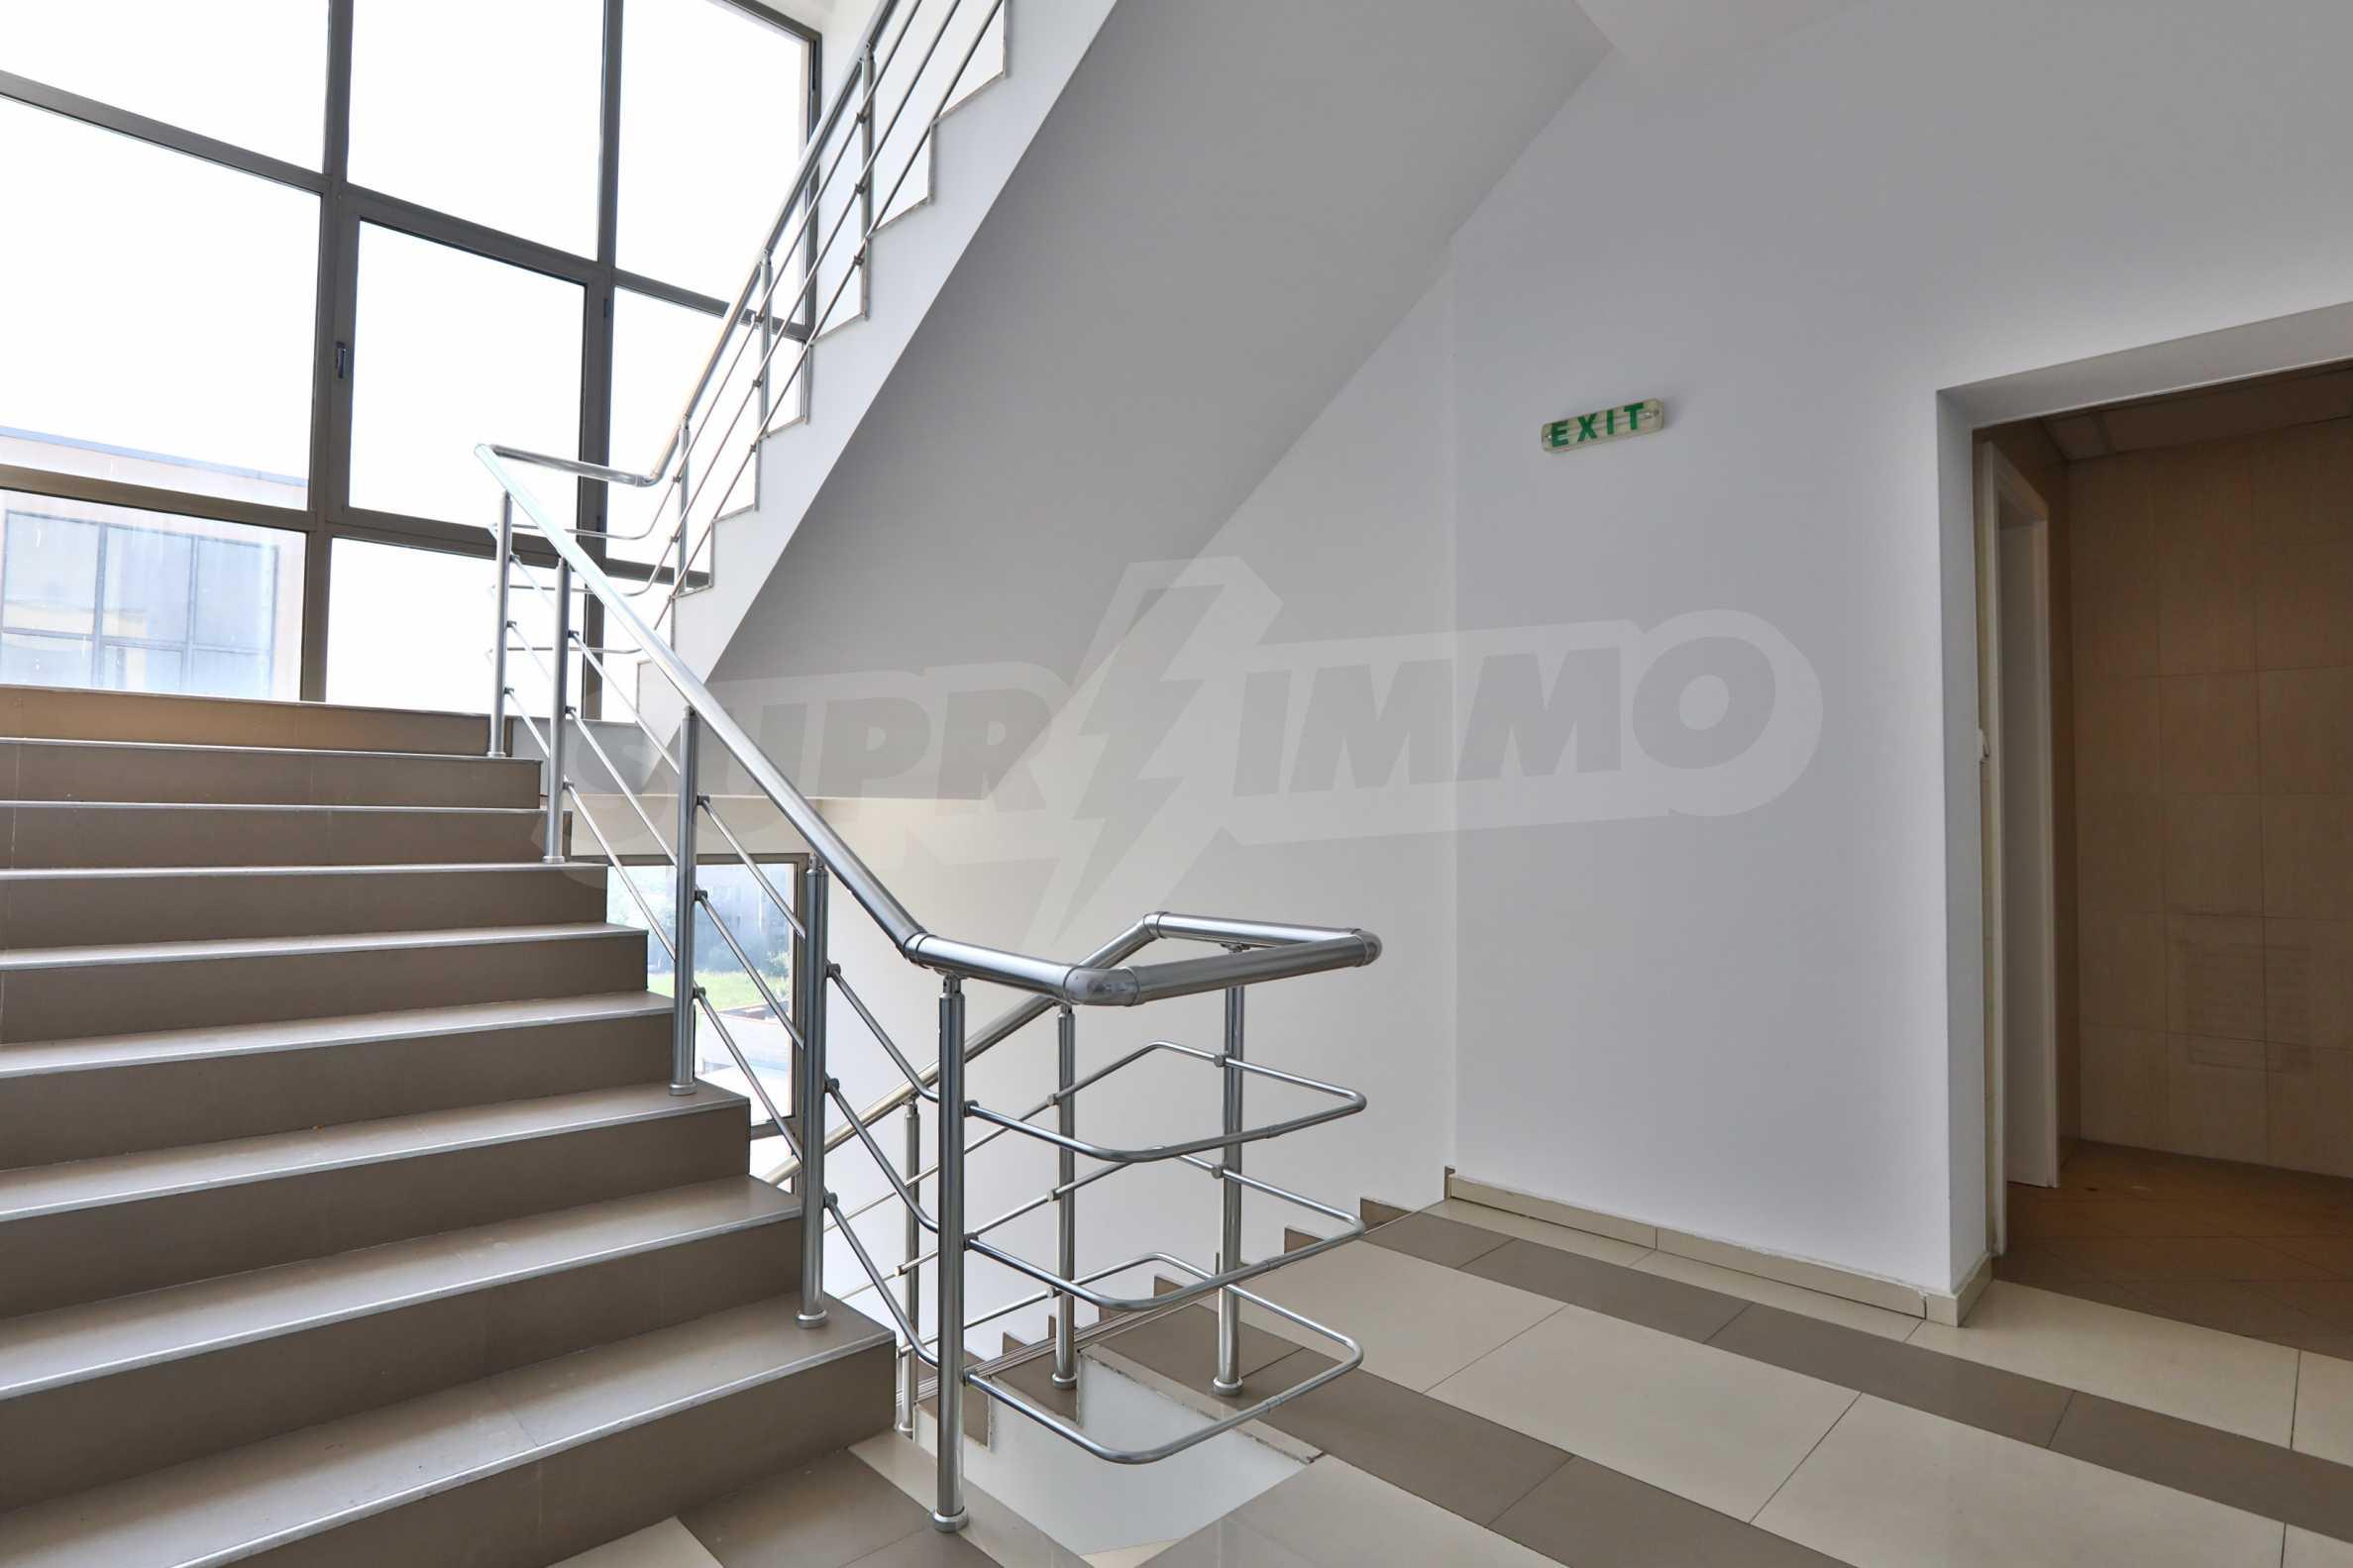 Офис в бизнес сграда висок клас на бул. Цариградско шосе 16